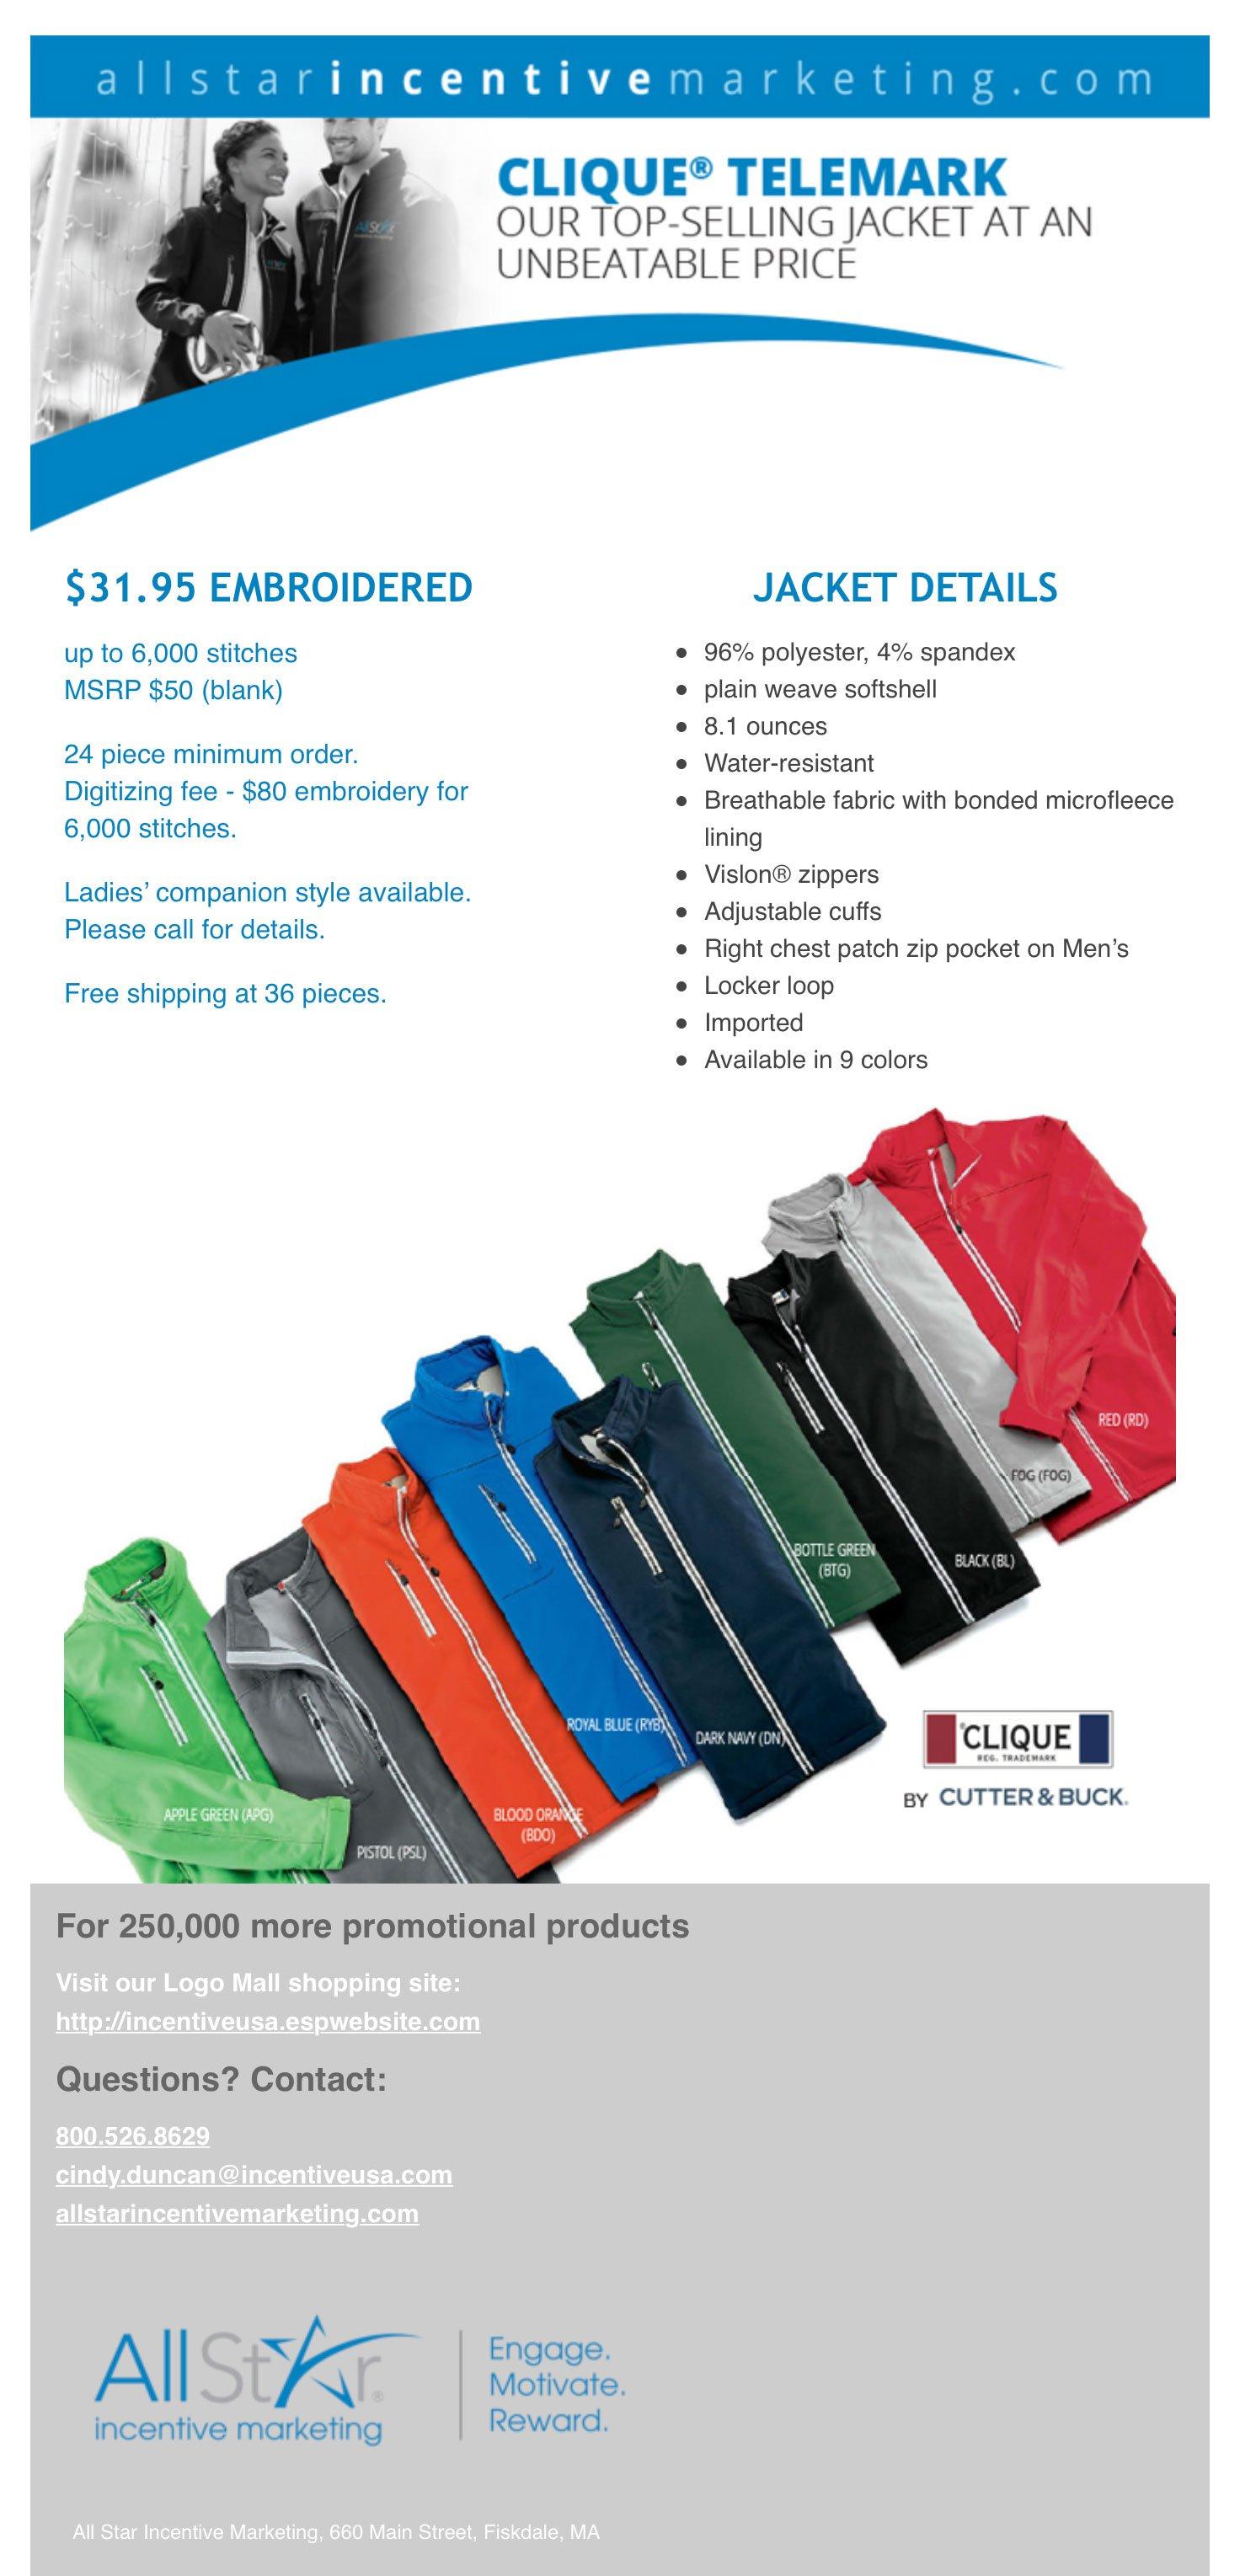 Clique Telemark Jacket